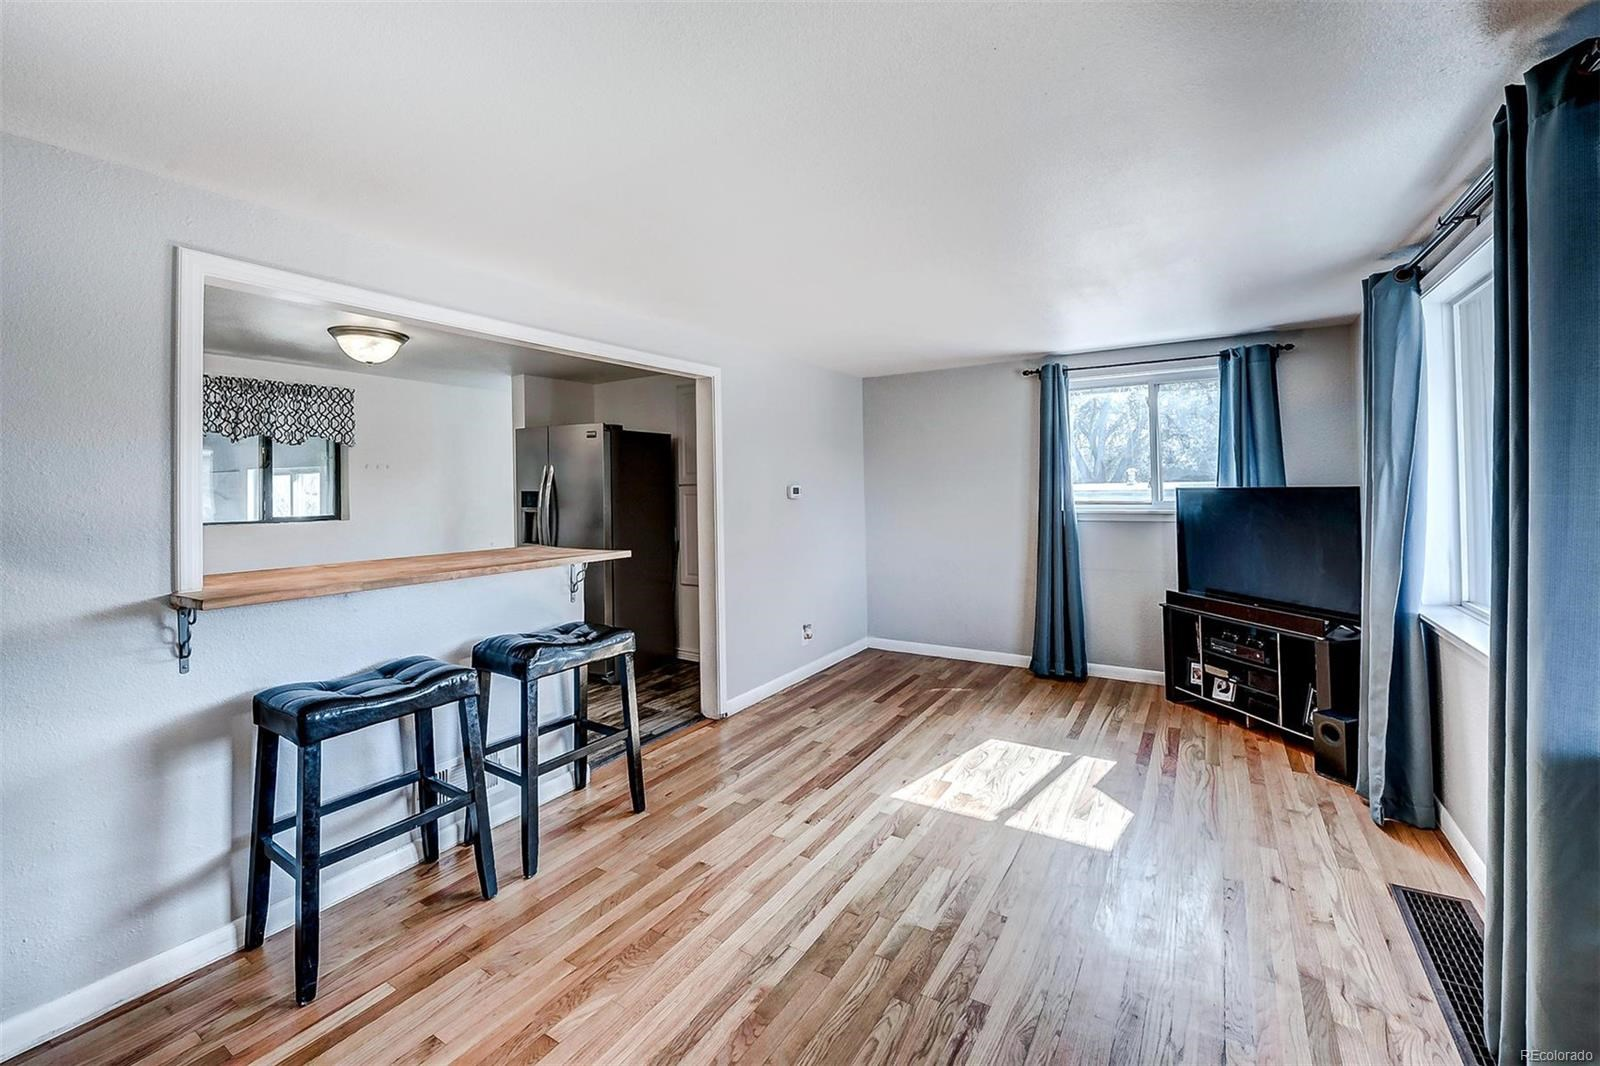 MLS# 4944251 - 1 - 1120  S Zenobia Street, Denver, CO 80219